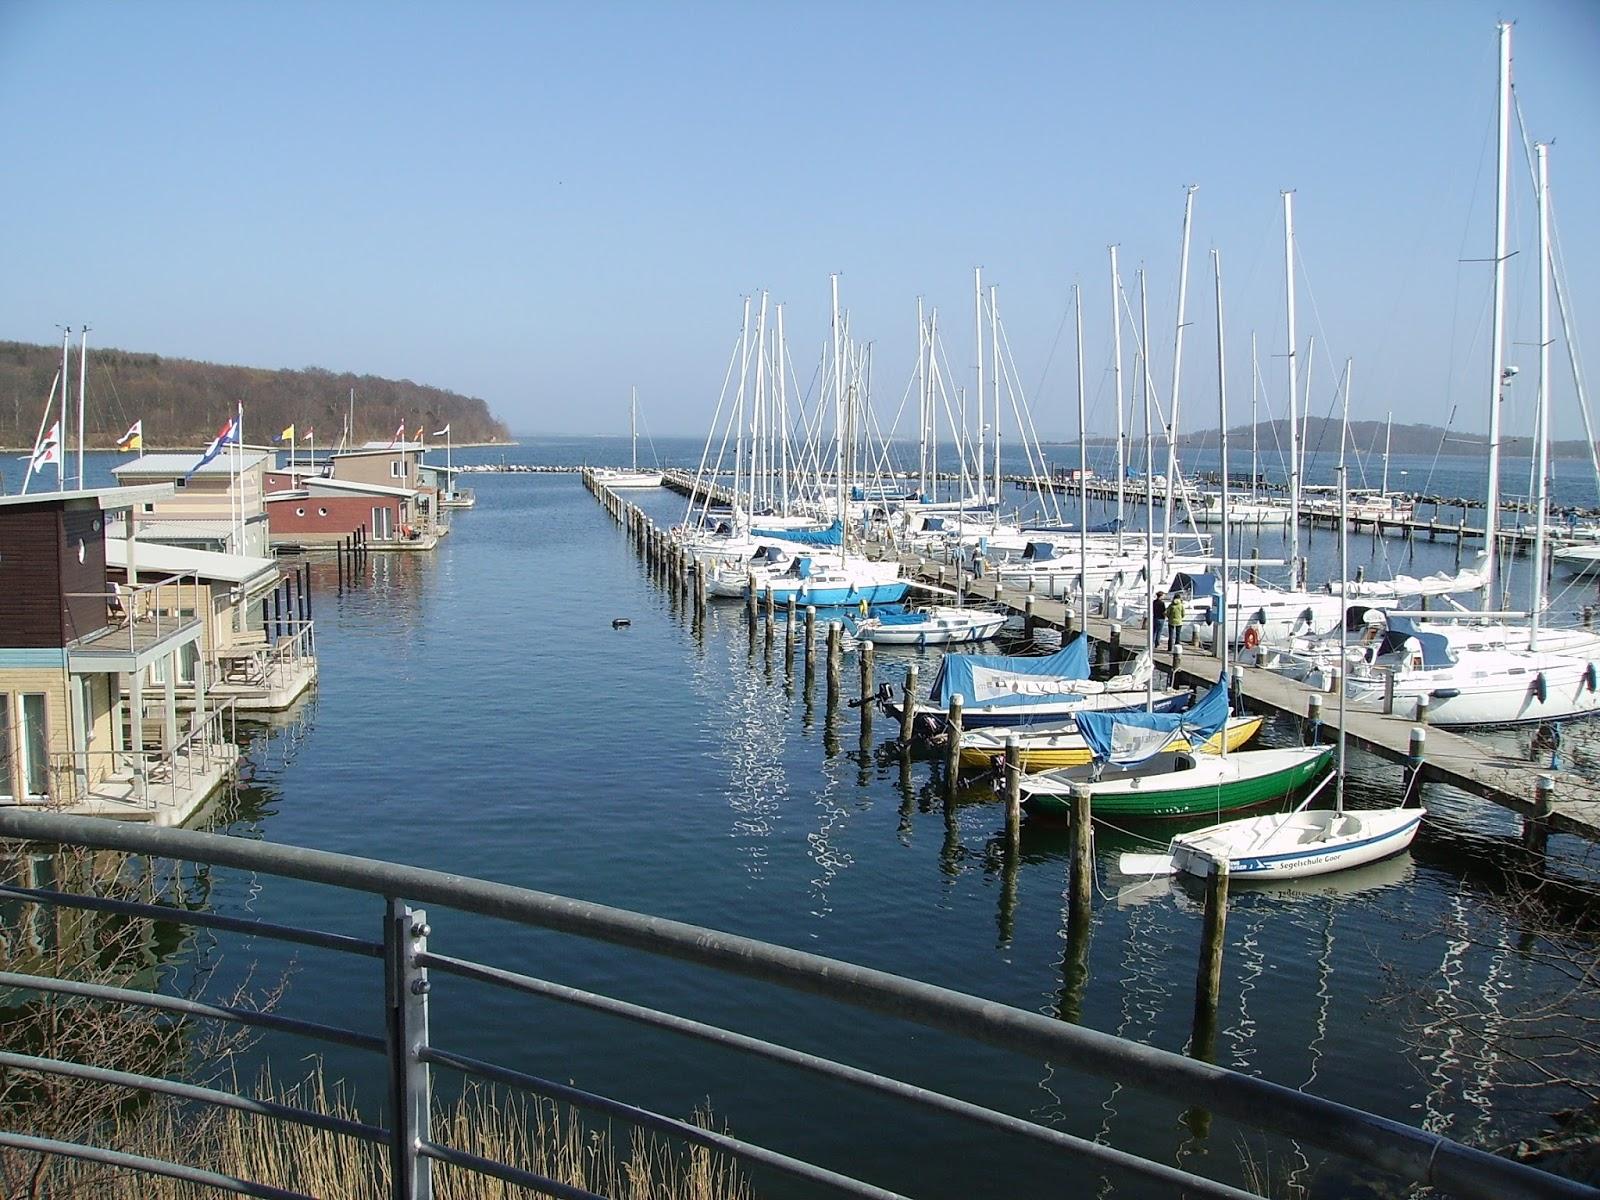 inselreport.de: Der Hafen Lauterbach (54° 21 ' N 013° 30 ' E)